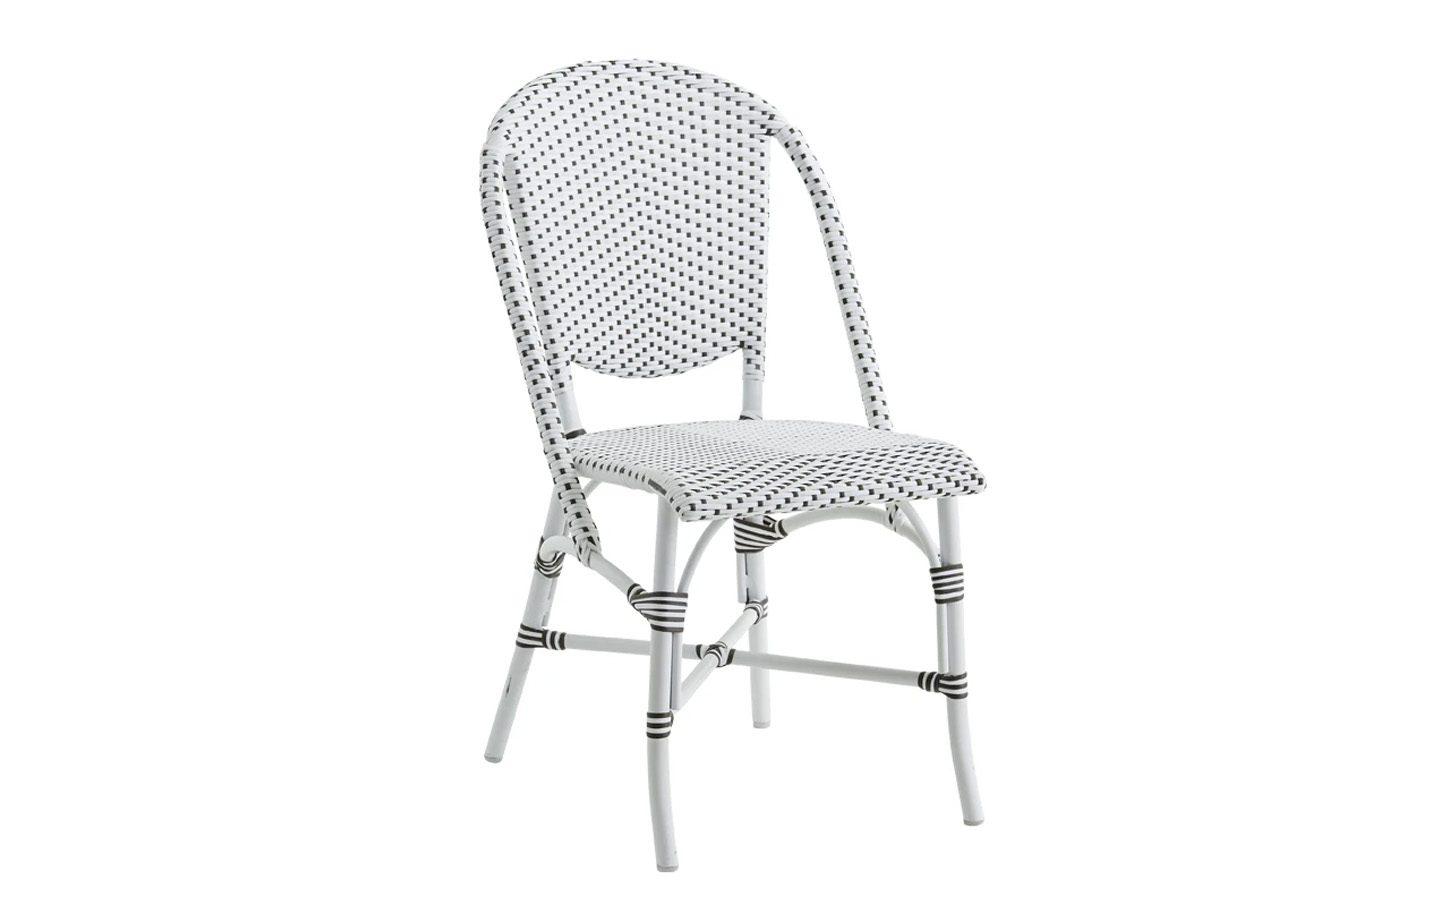 Sofie-Alu-Rattan-Side-Chair-White